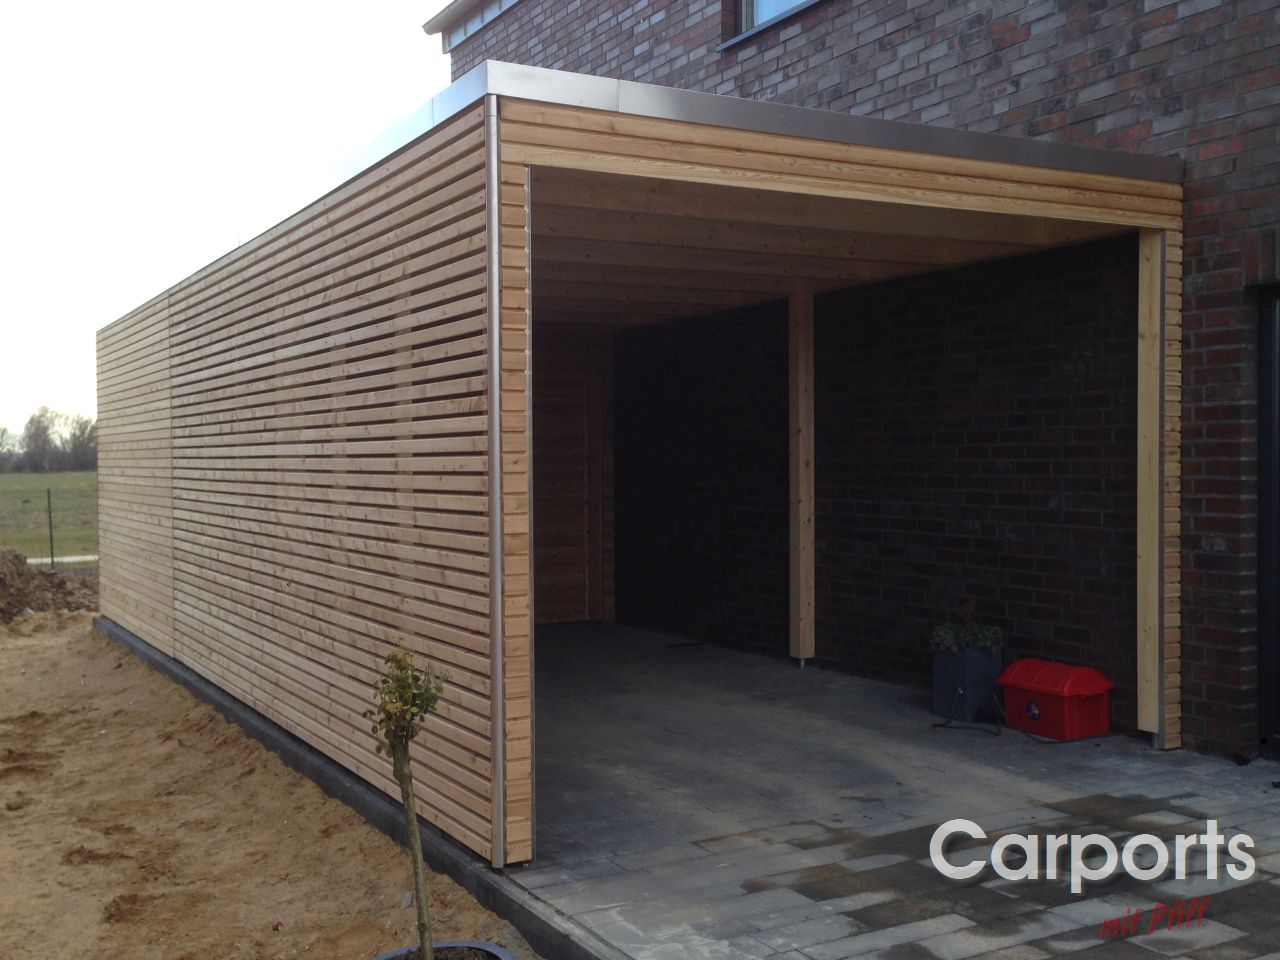 carport bauhaus rhombo aus sibirischer l rche carports mit pfiff. Black Bedroom Furniture Sets. Home Design Ideas